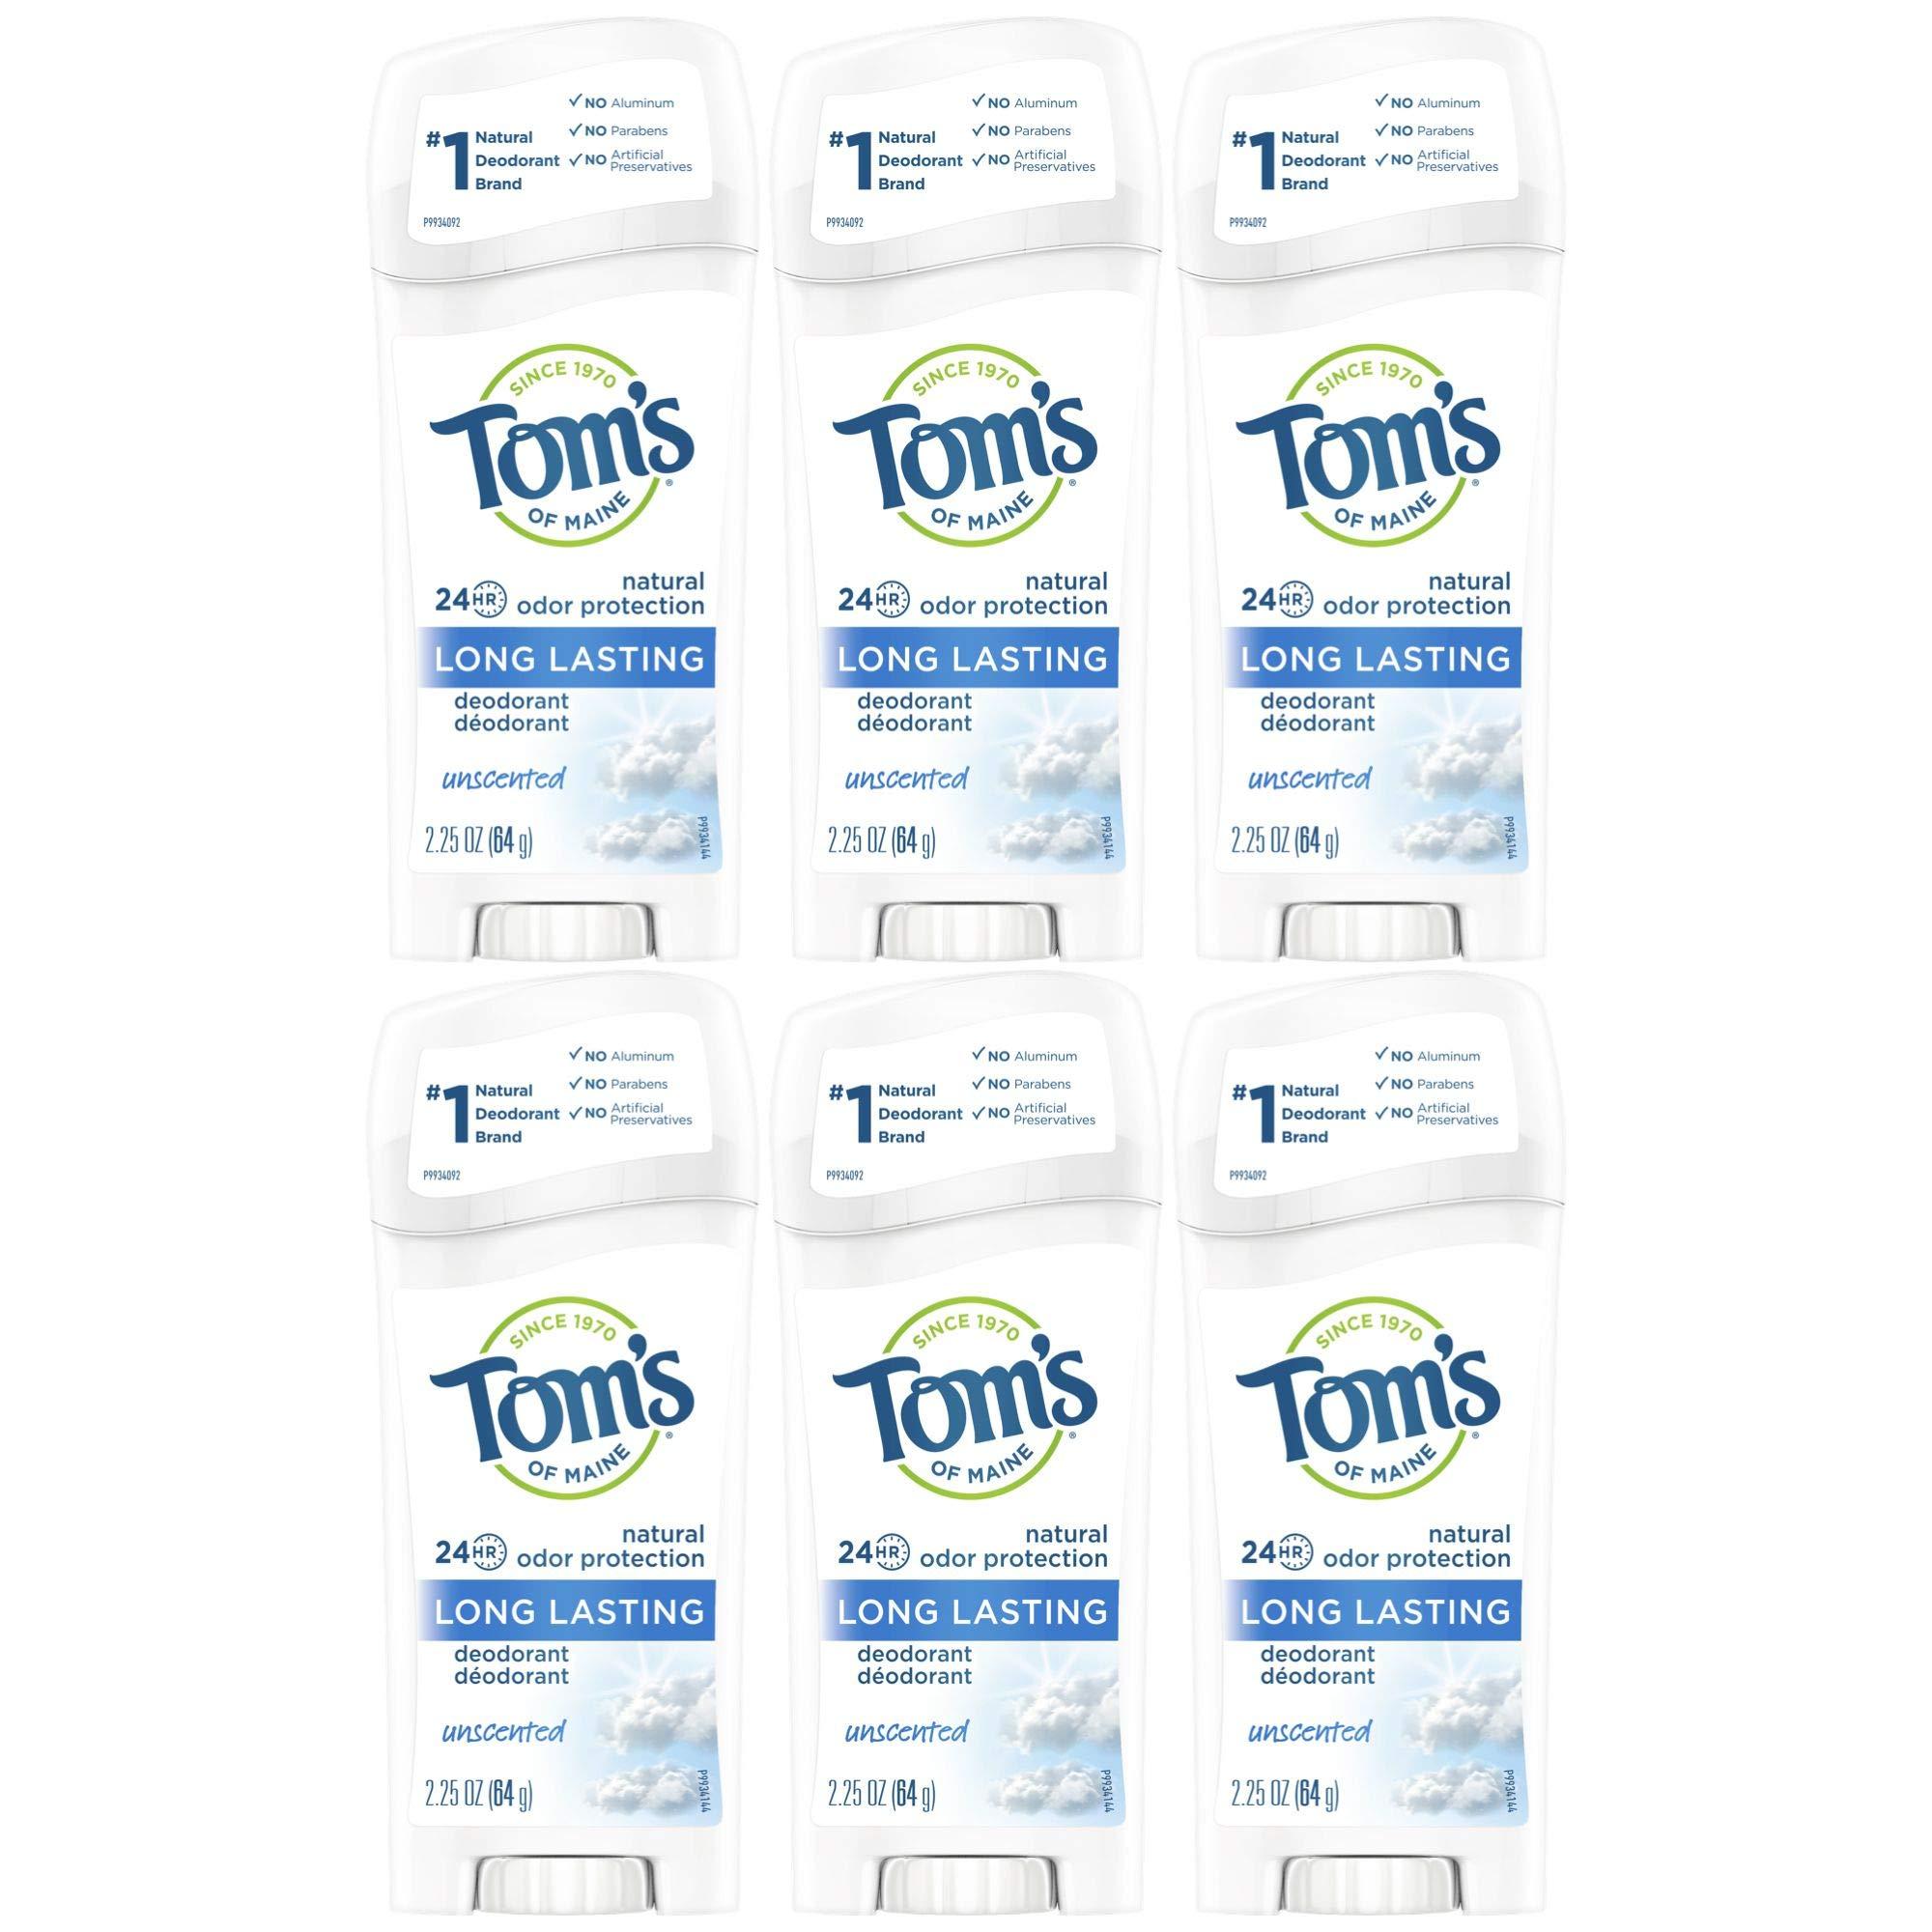 Toms Of Maine Natural Long-Lasting Deodorant Stick Unscented - 2.25 Oz (64 G) (6 sticks)